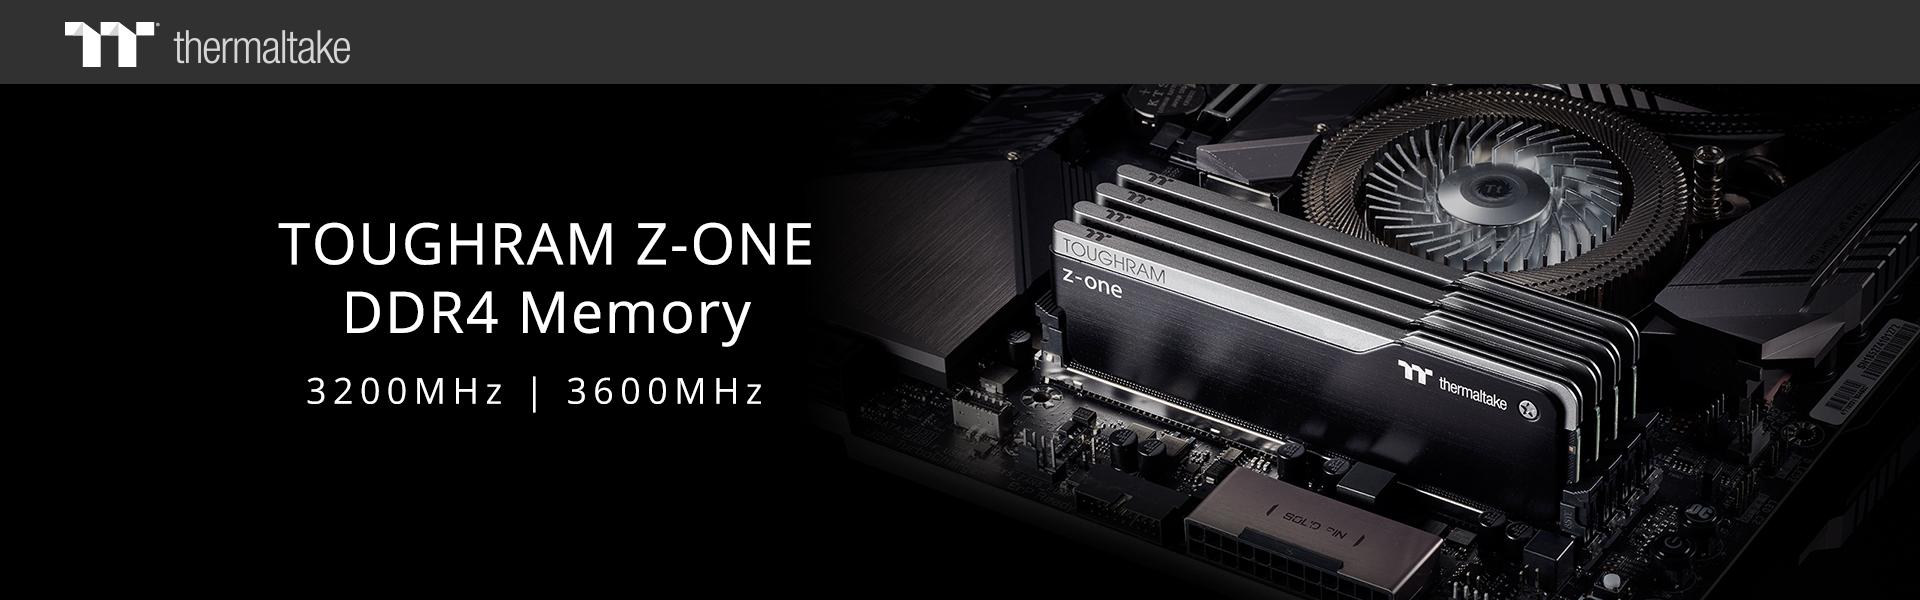 Thermaltake lanza la serie de memorias TOUGHRAM Z-ONE: 3200 / 3600MHz